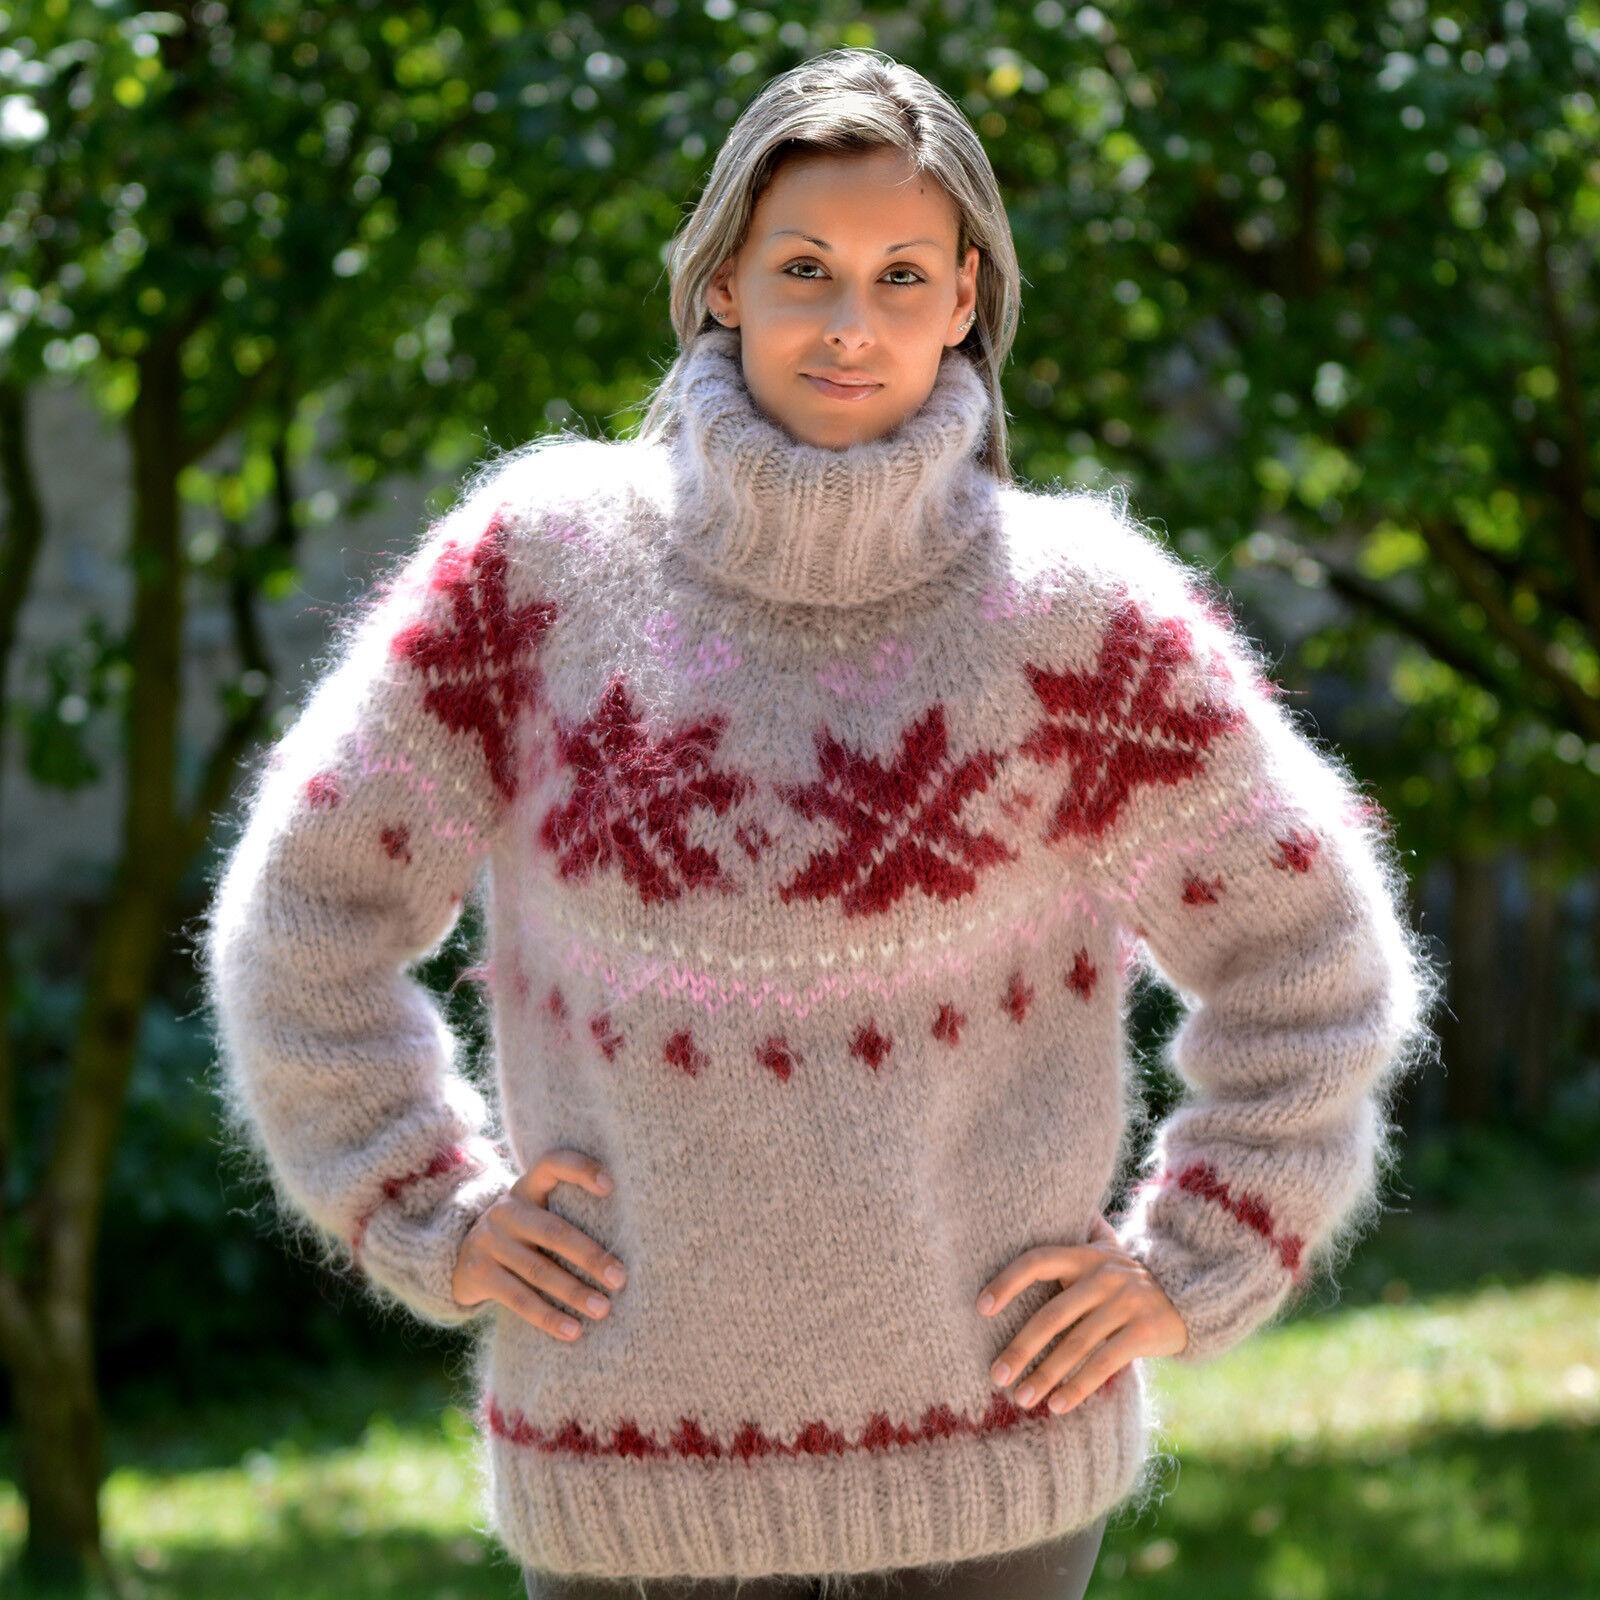 Hand Knit Mohair Sweater Icelandic Nordic Fuzzy Fuzzy Fuzzy Beige Red EXTRAVAGANTZA M L XL 25f5e9